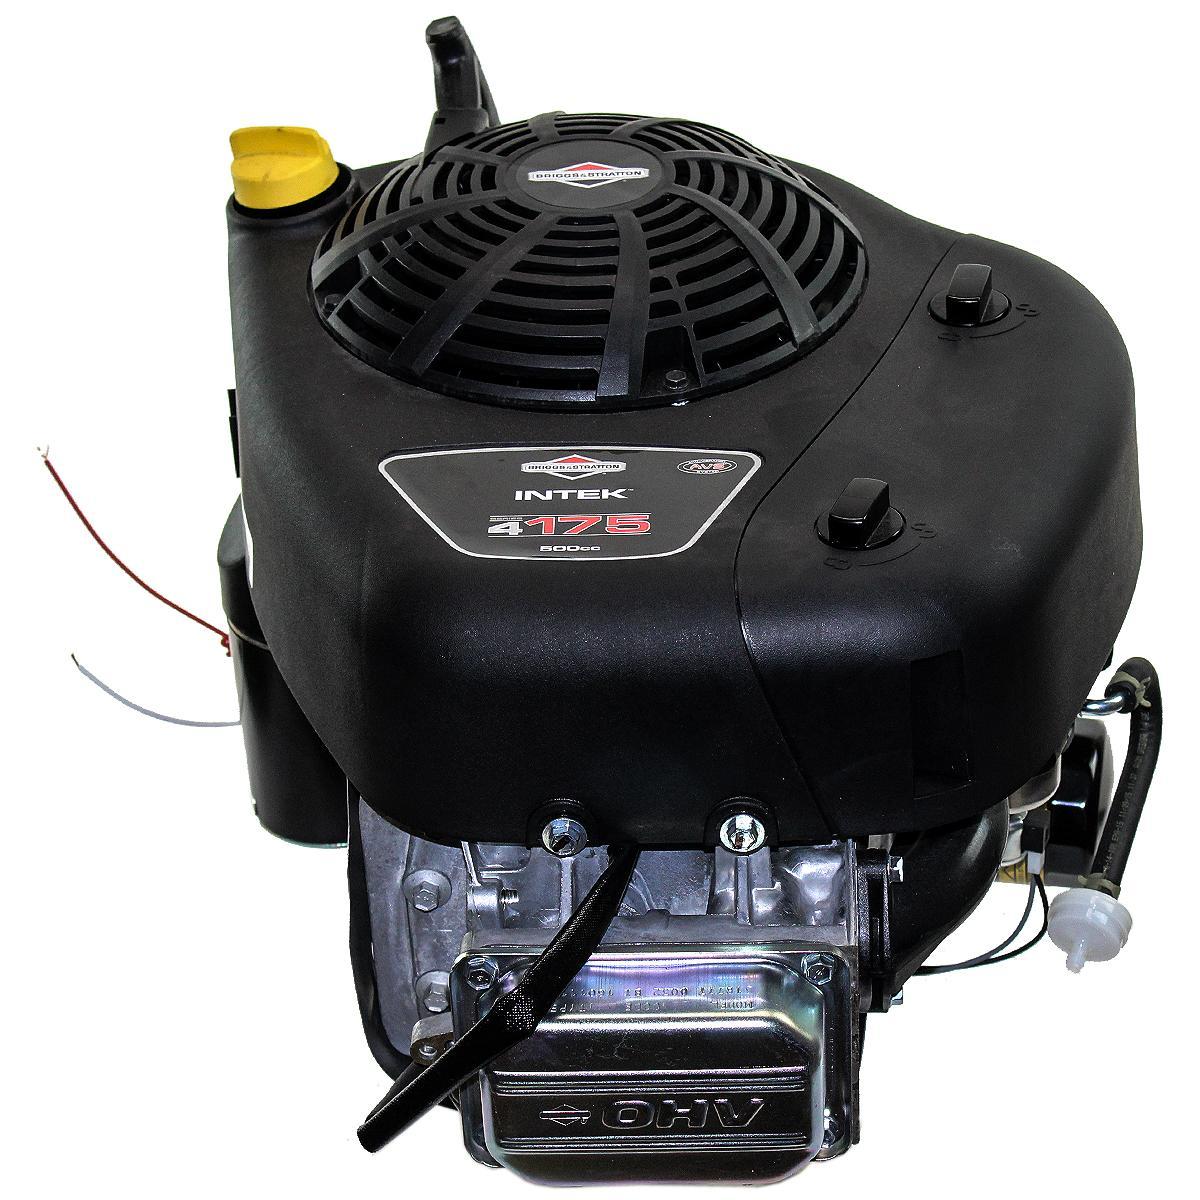 Poulan Pro Bb18542lt Repower Fuel Filter 31r777 0032